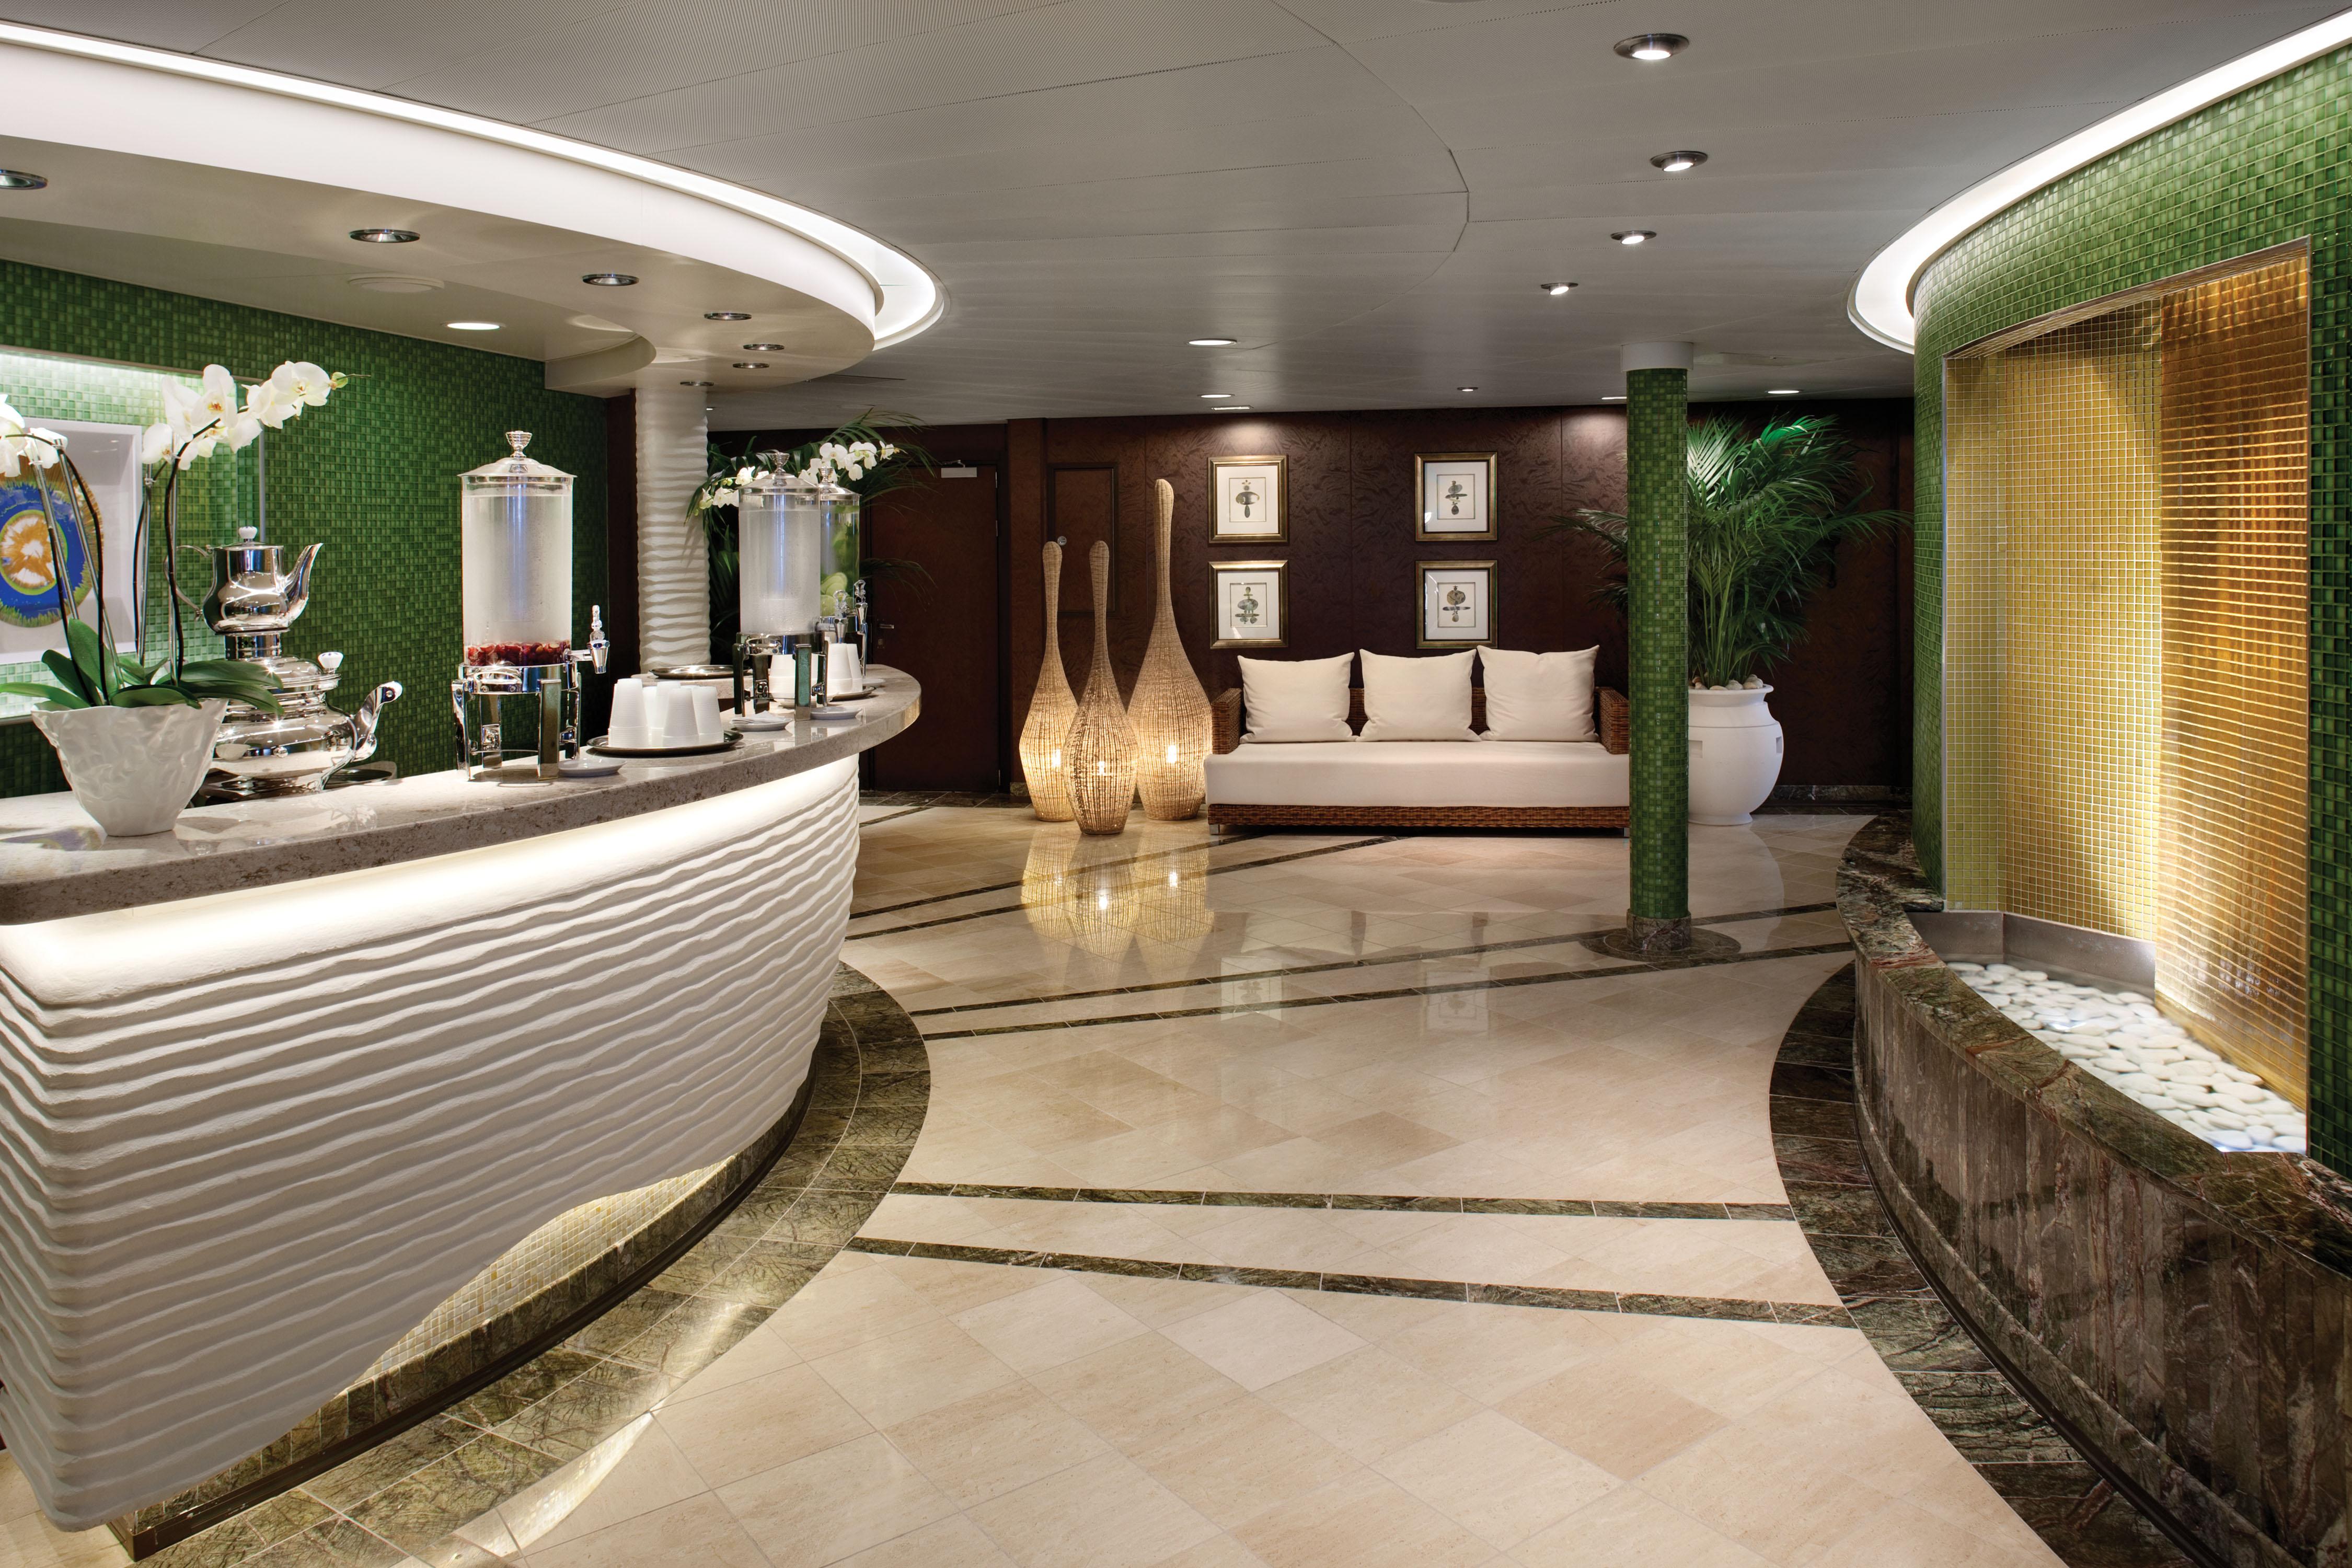 Oceania Cruises Oceania Class Interior Spa Juice Bar.jpg